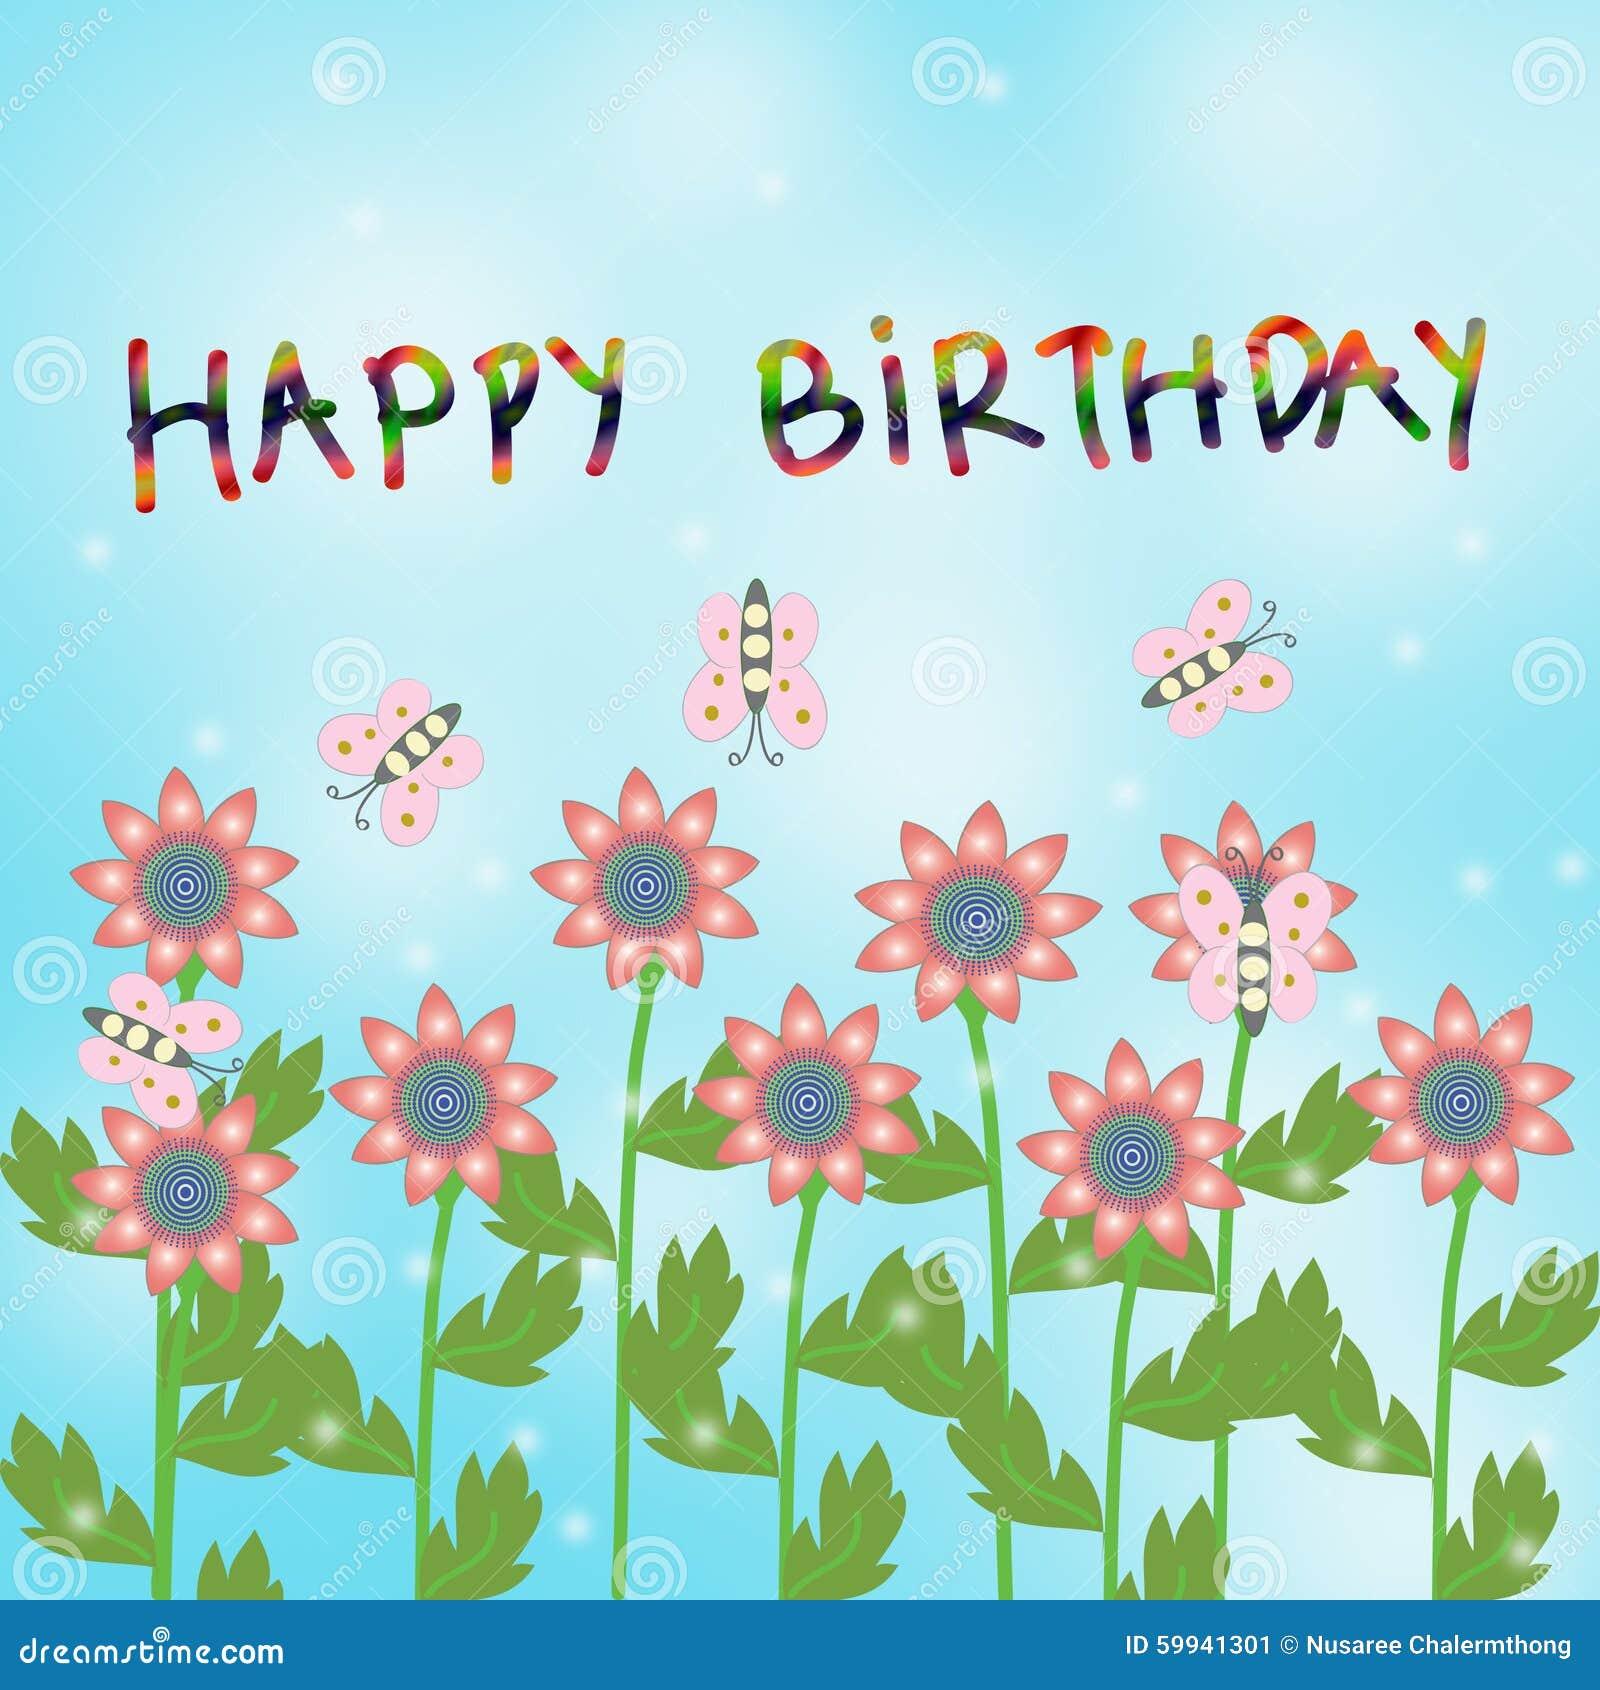 Happy birthday card stock illustration illustration of flowers download happy birthday card stock illustration illustration of flowers 59941301 izmirmasajfo